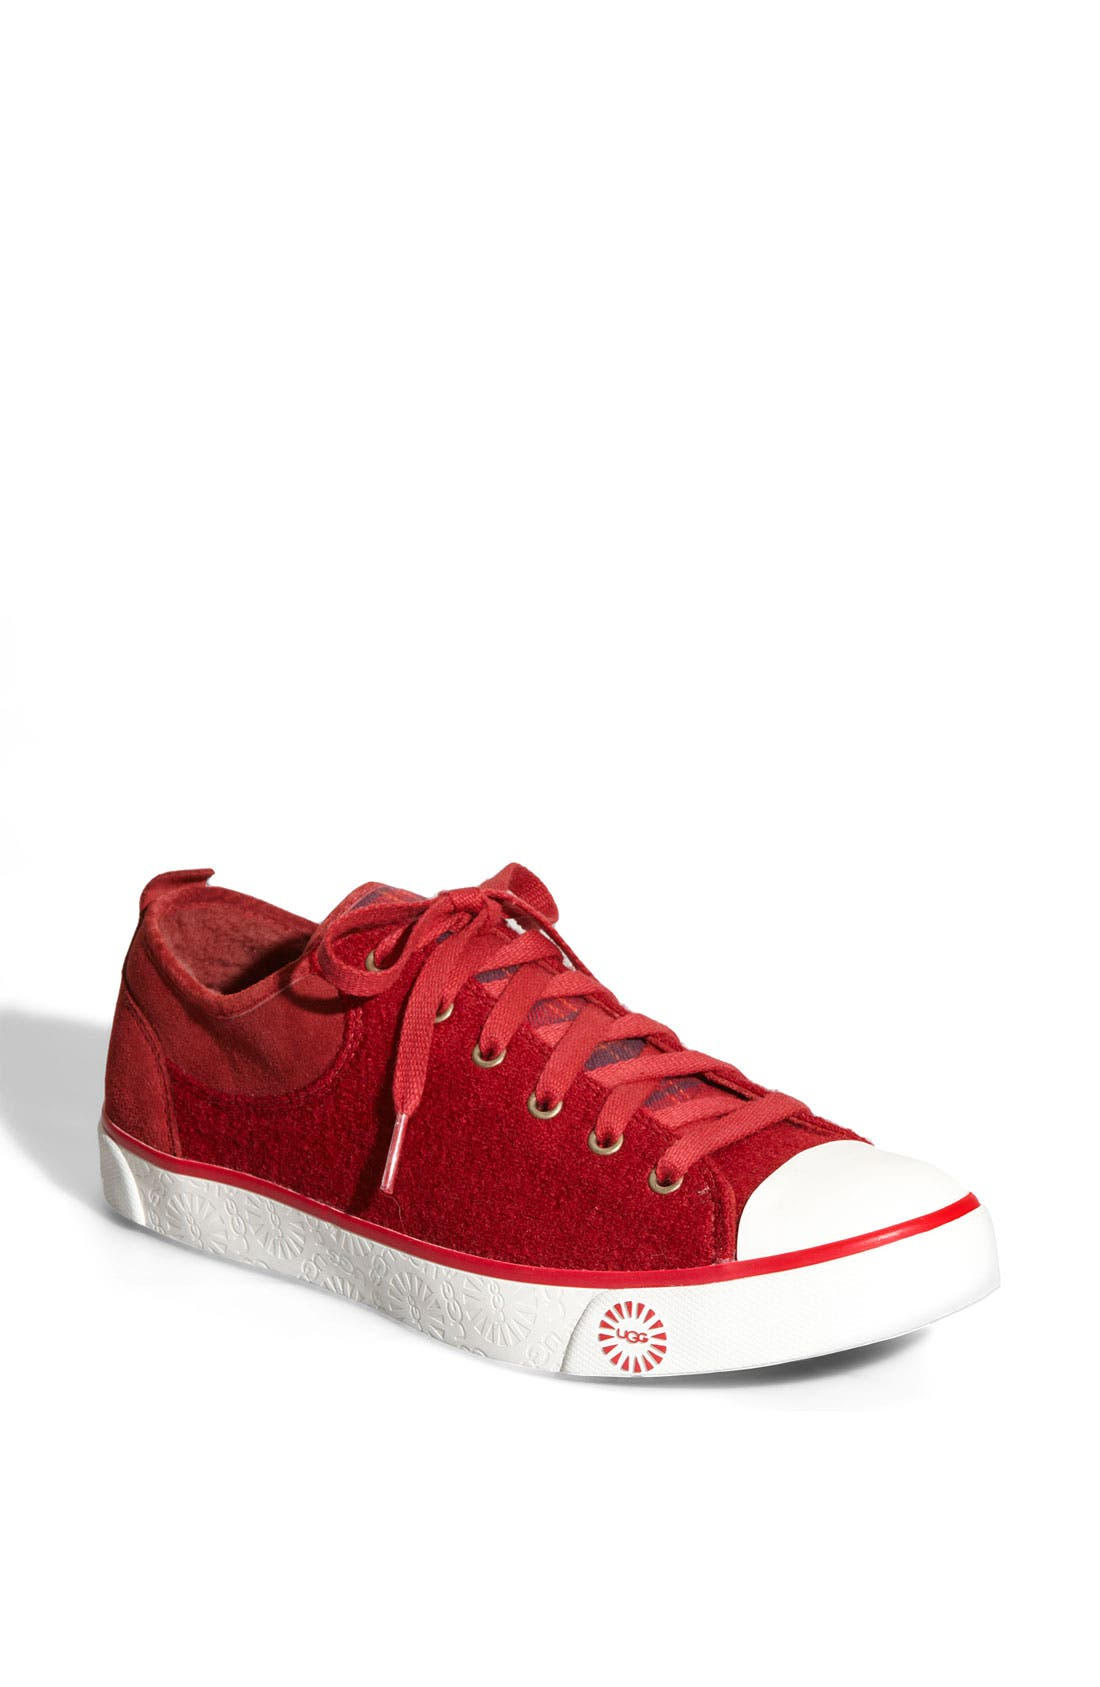 Australia 'Evera' Suede Sneaker,                             Main thumbnail 1, color,                             003